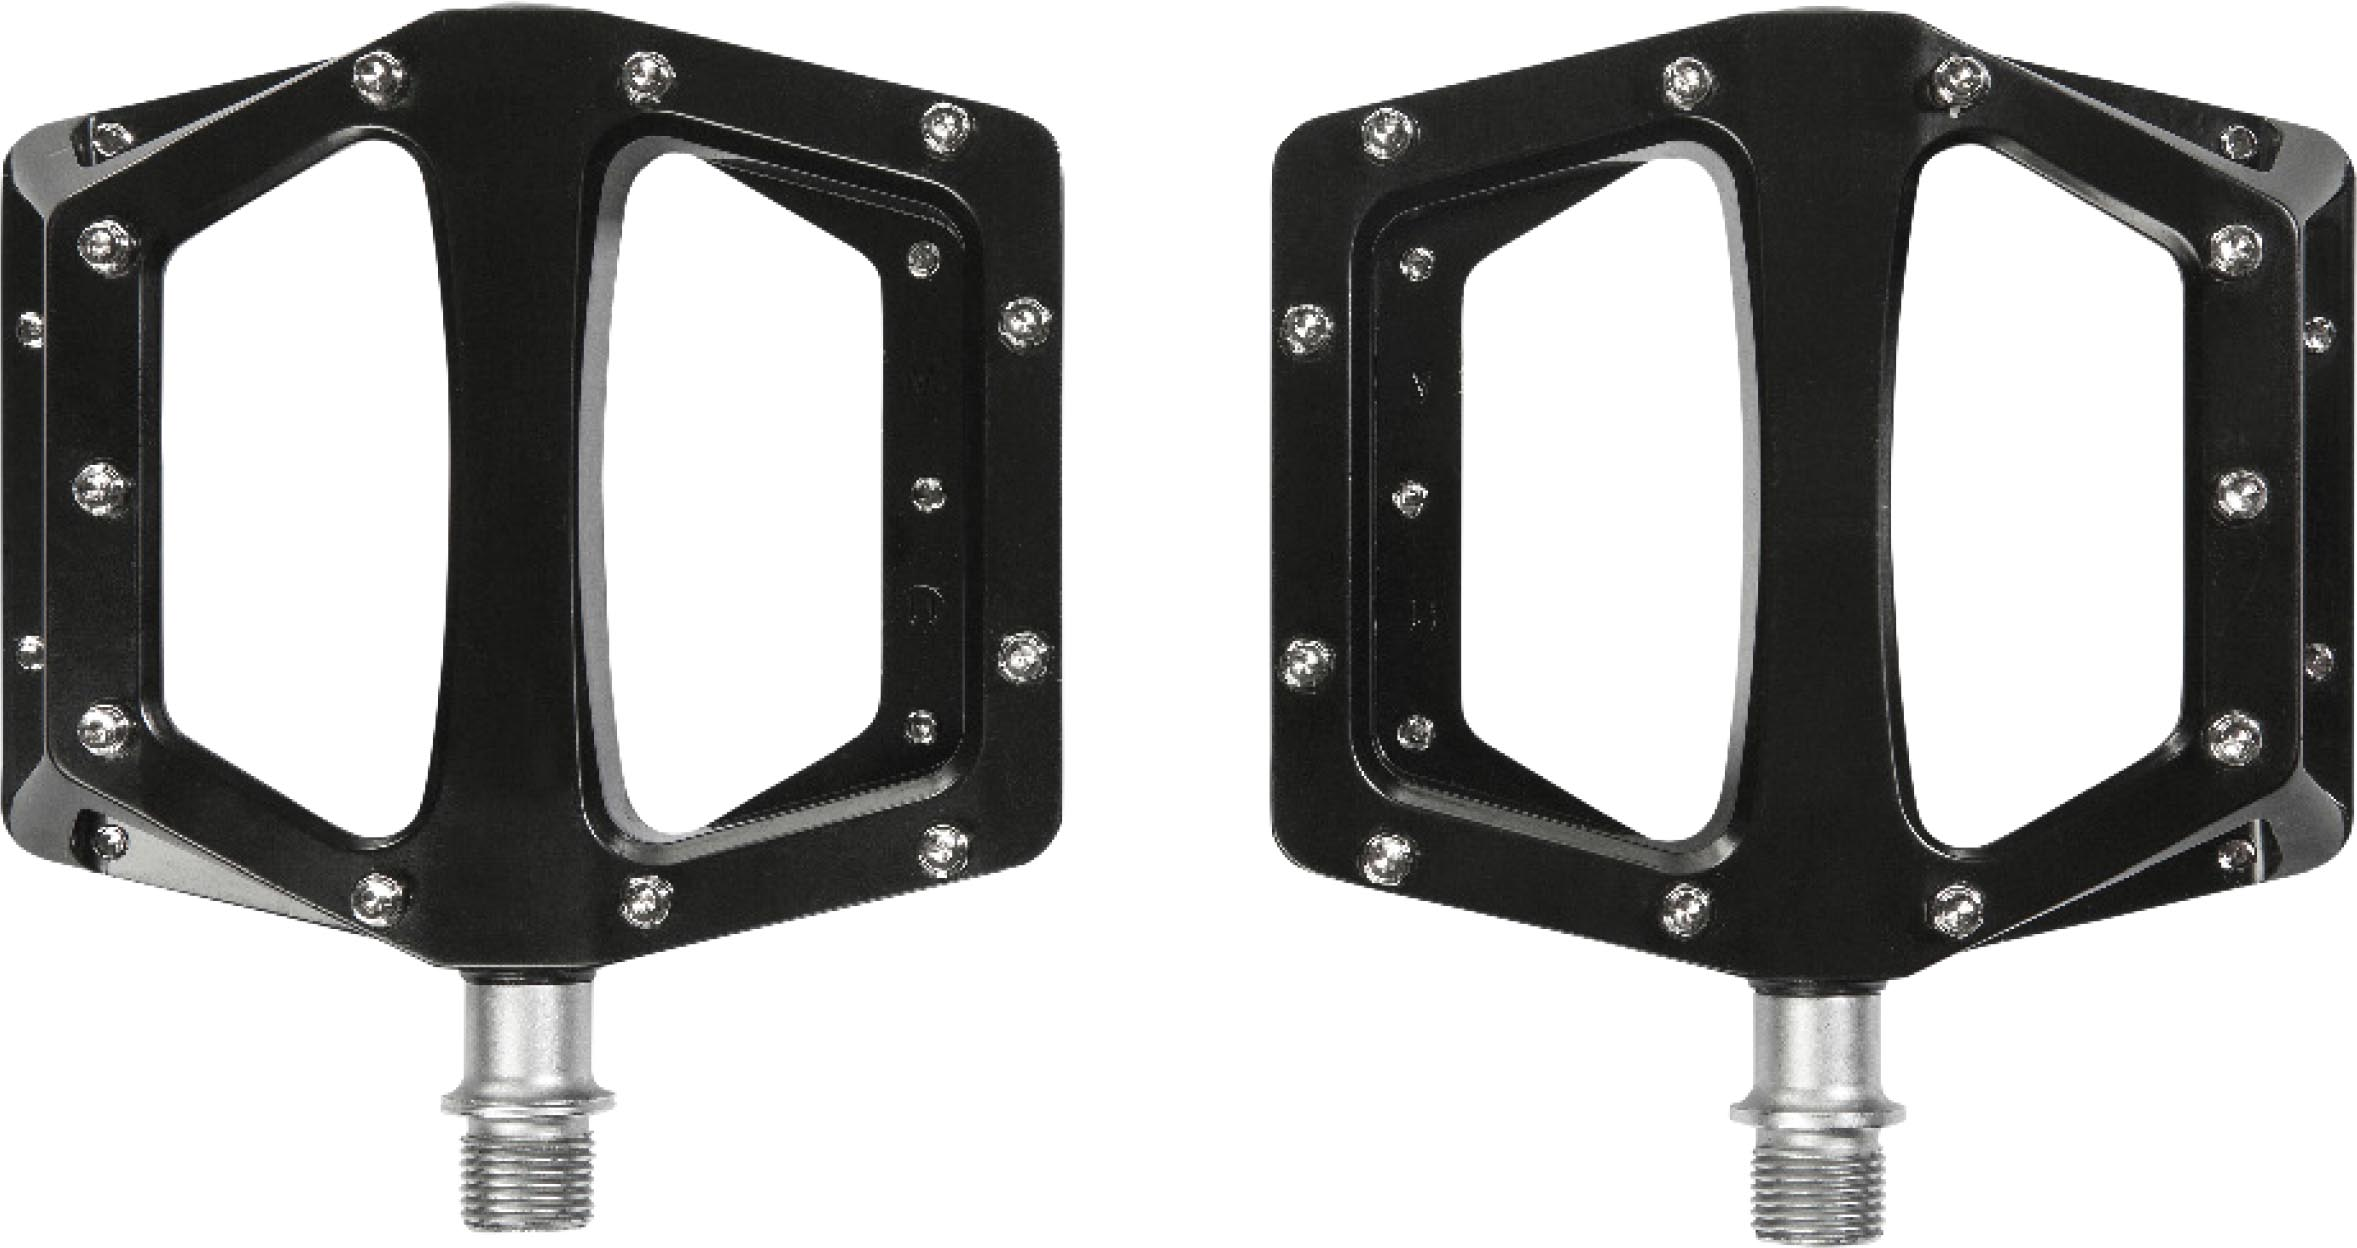 cube rfr pedale flat race schwarz pedale zubeh r. Black Bedroom Furniture Sets. Home Design Ideas